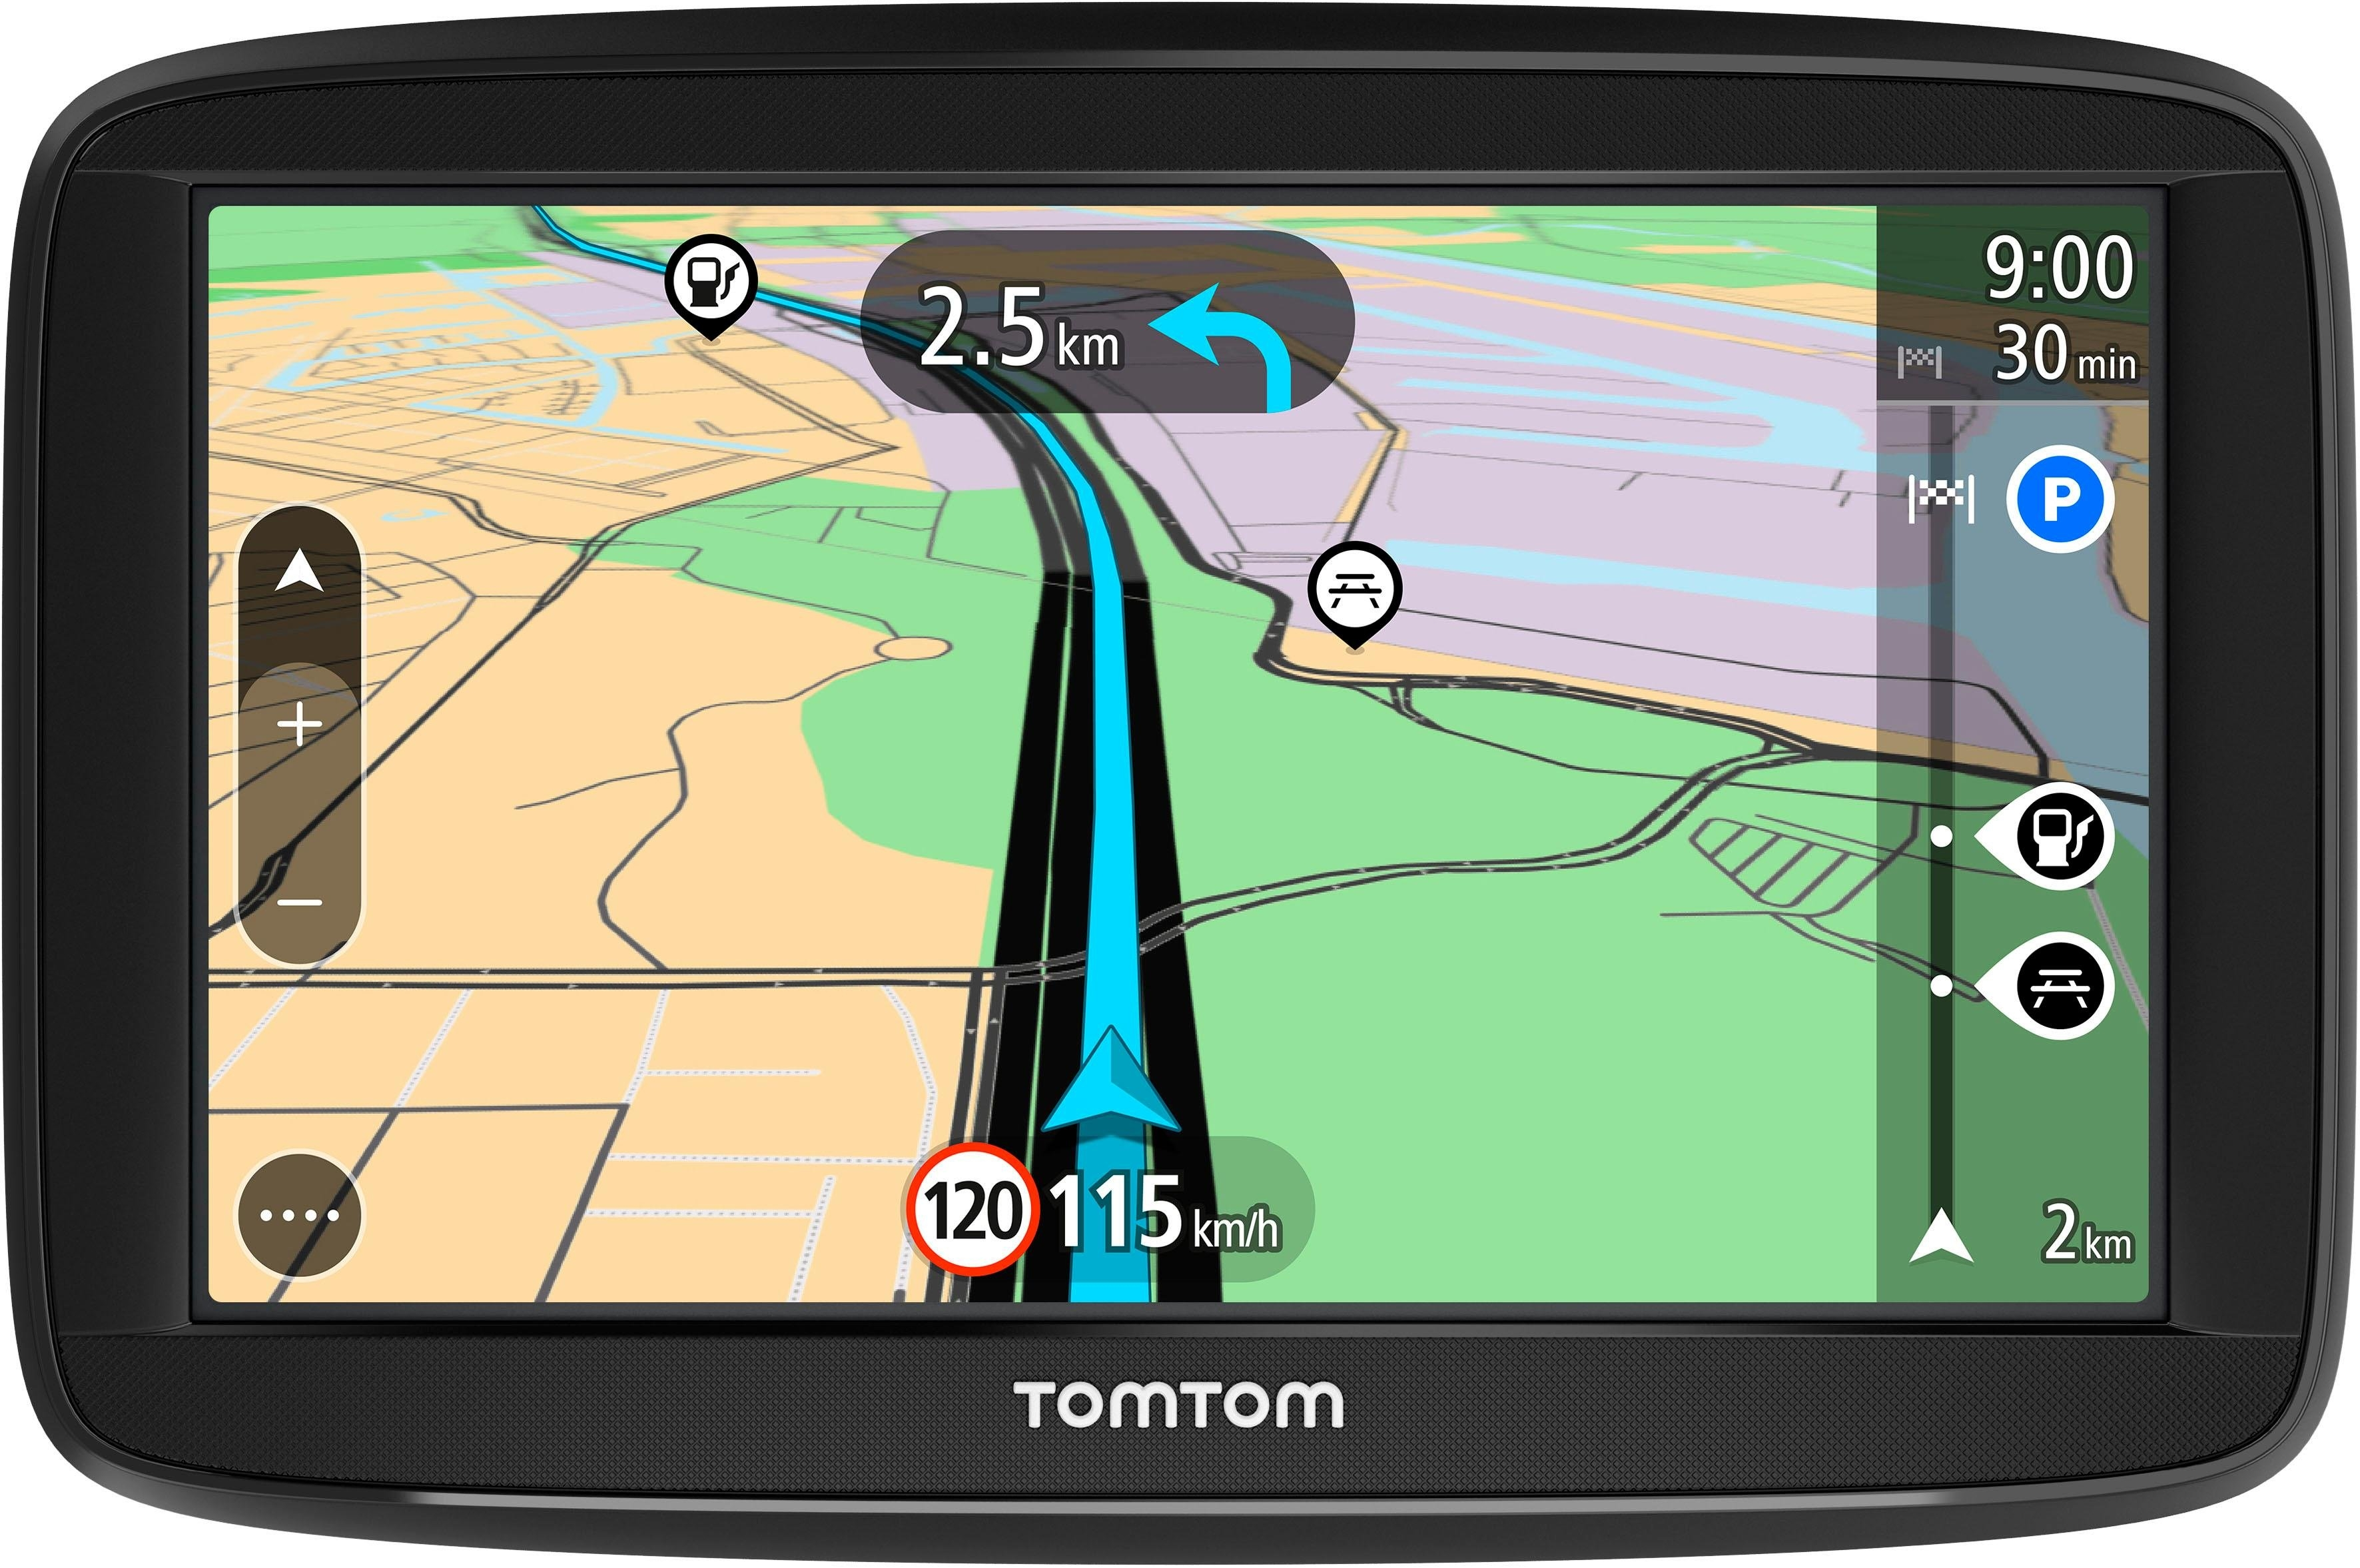 TomTom »Start 52 EU T« navigatiesysteem (Europa (45 landen), incl. levenslange kaart-updates) - verschillende betaalmethodes